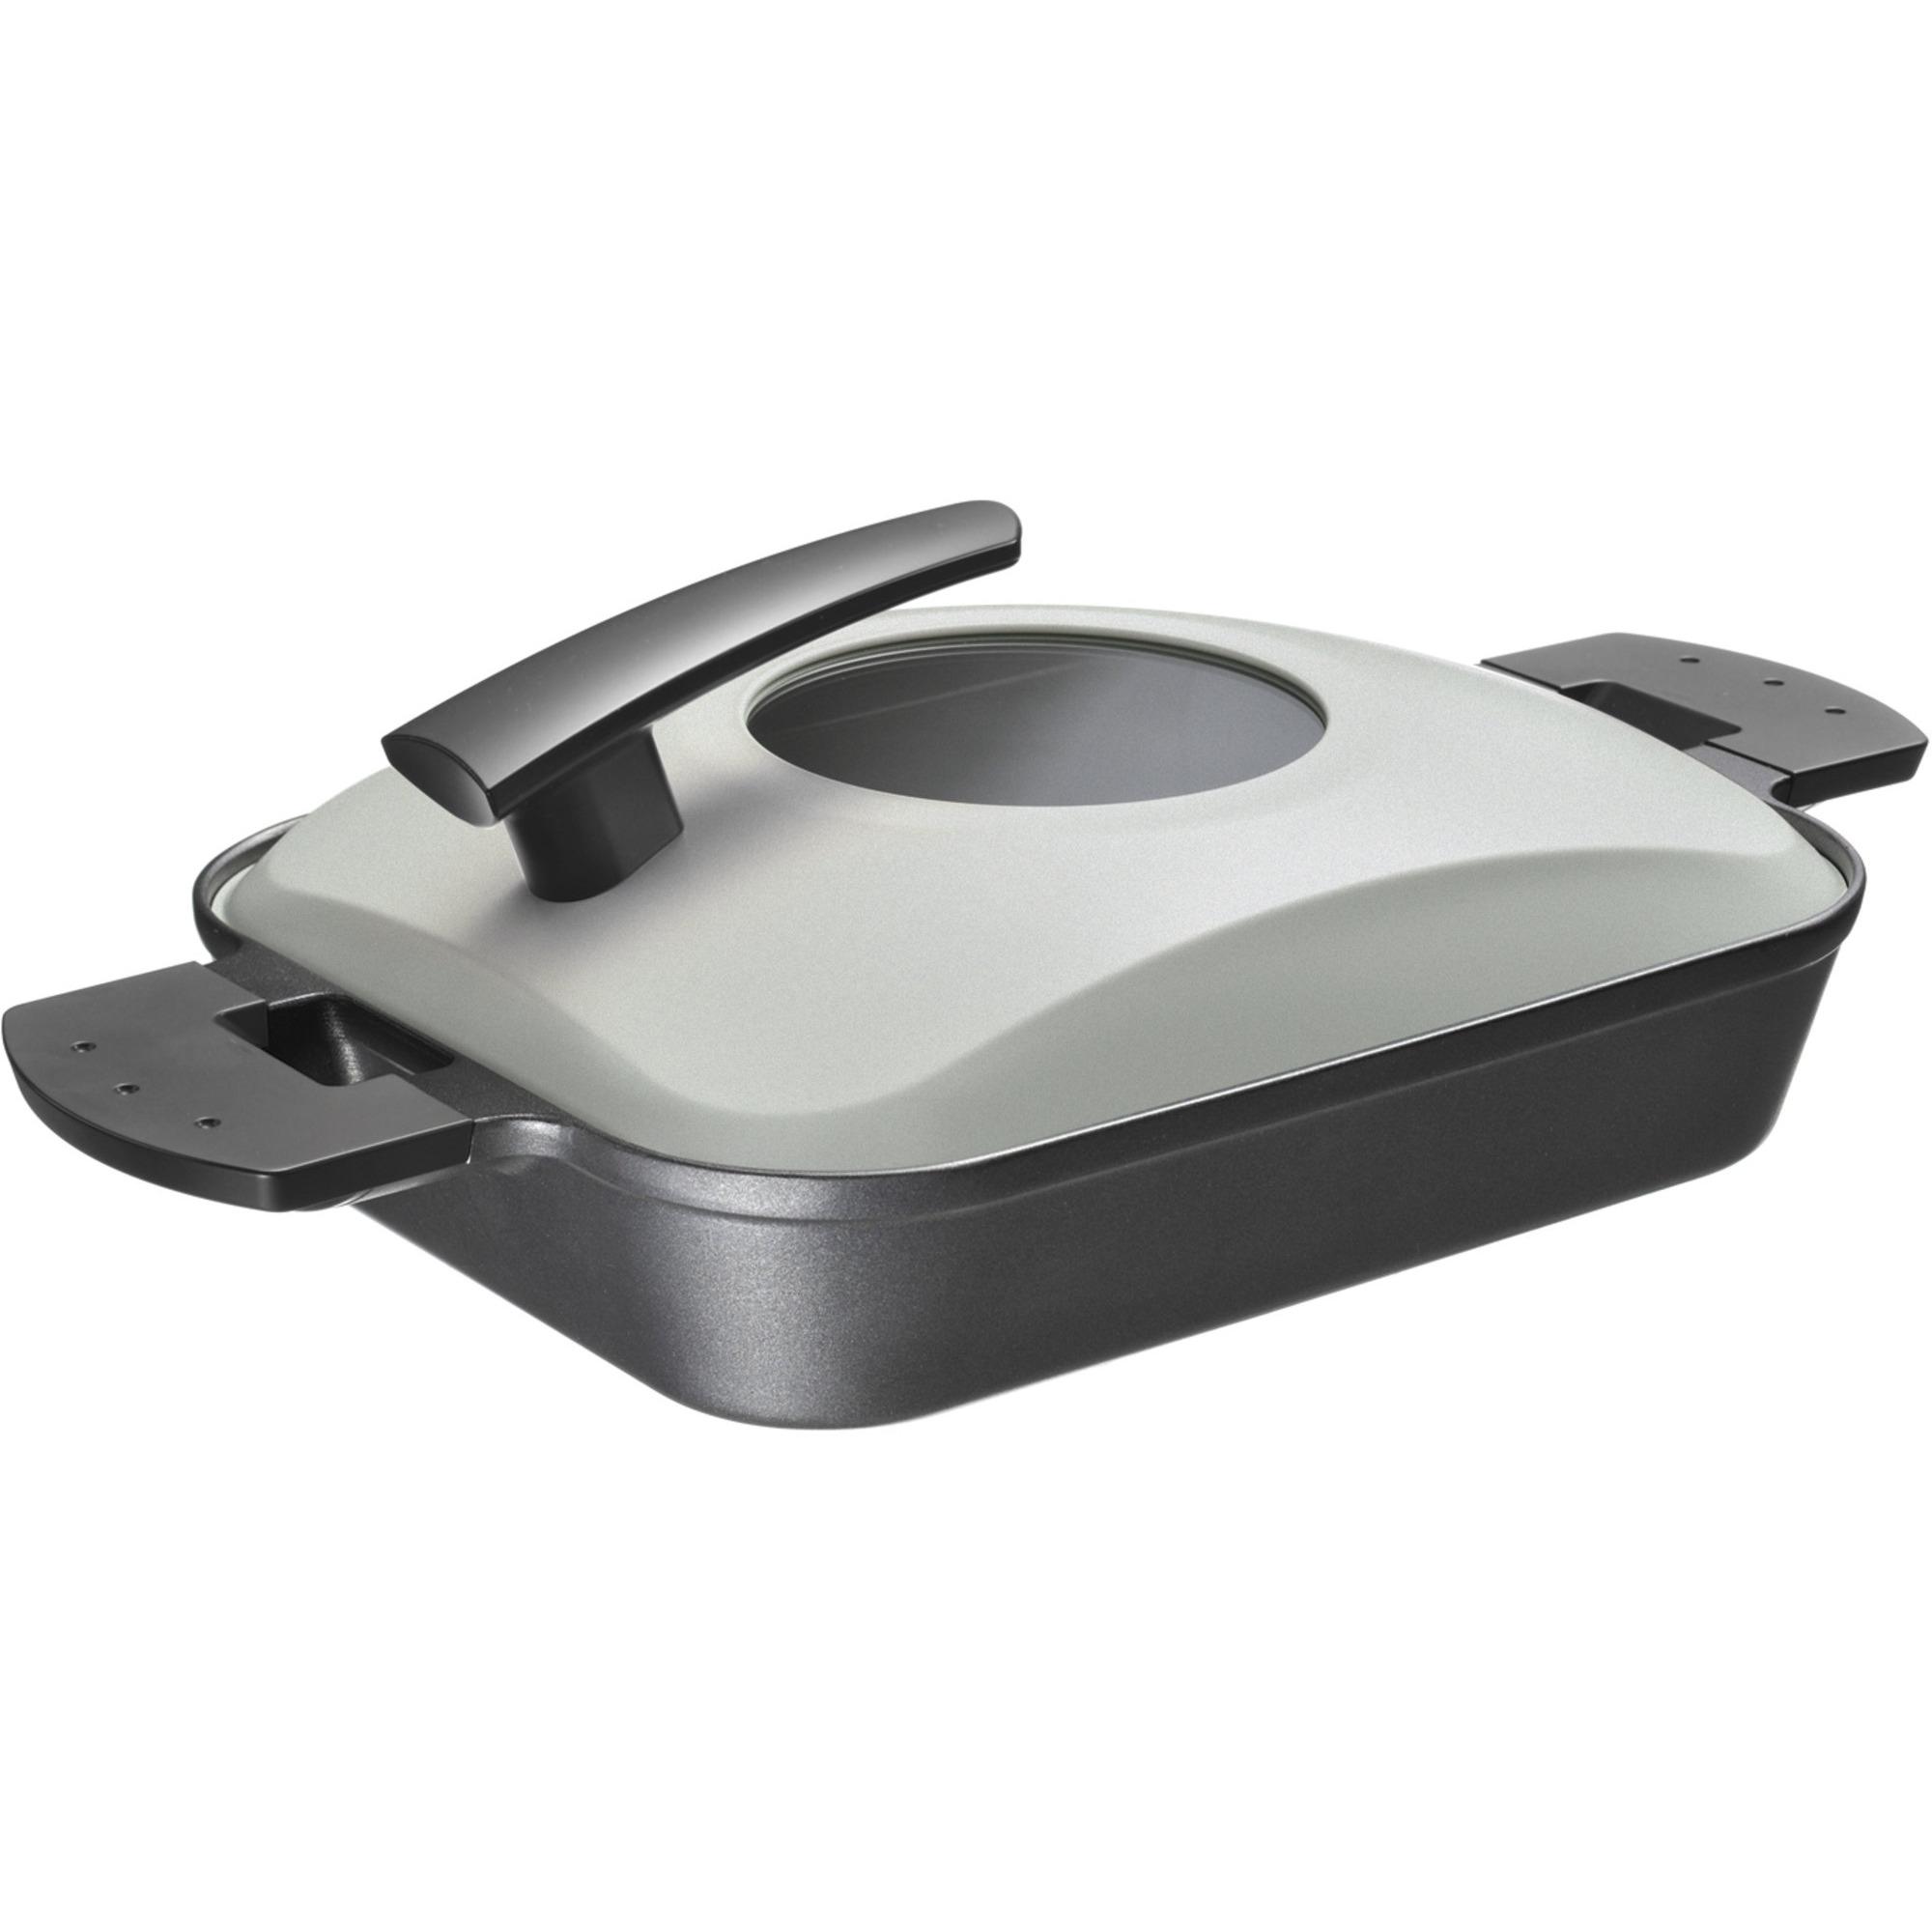 Witt Steam Grill svart m. stållock